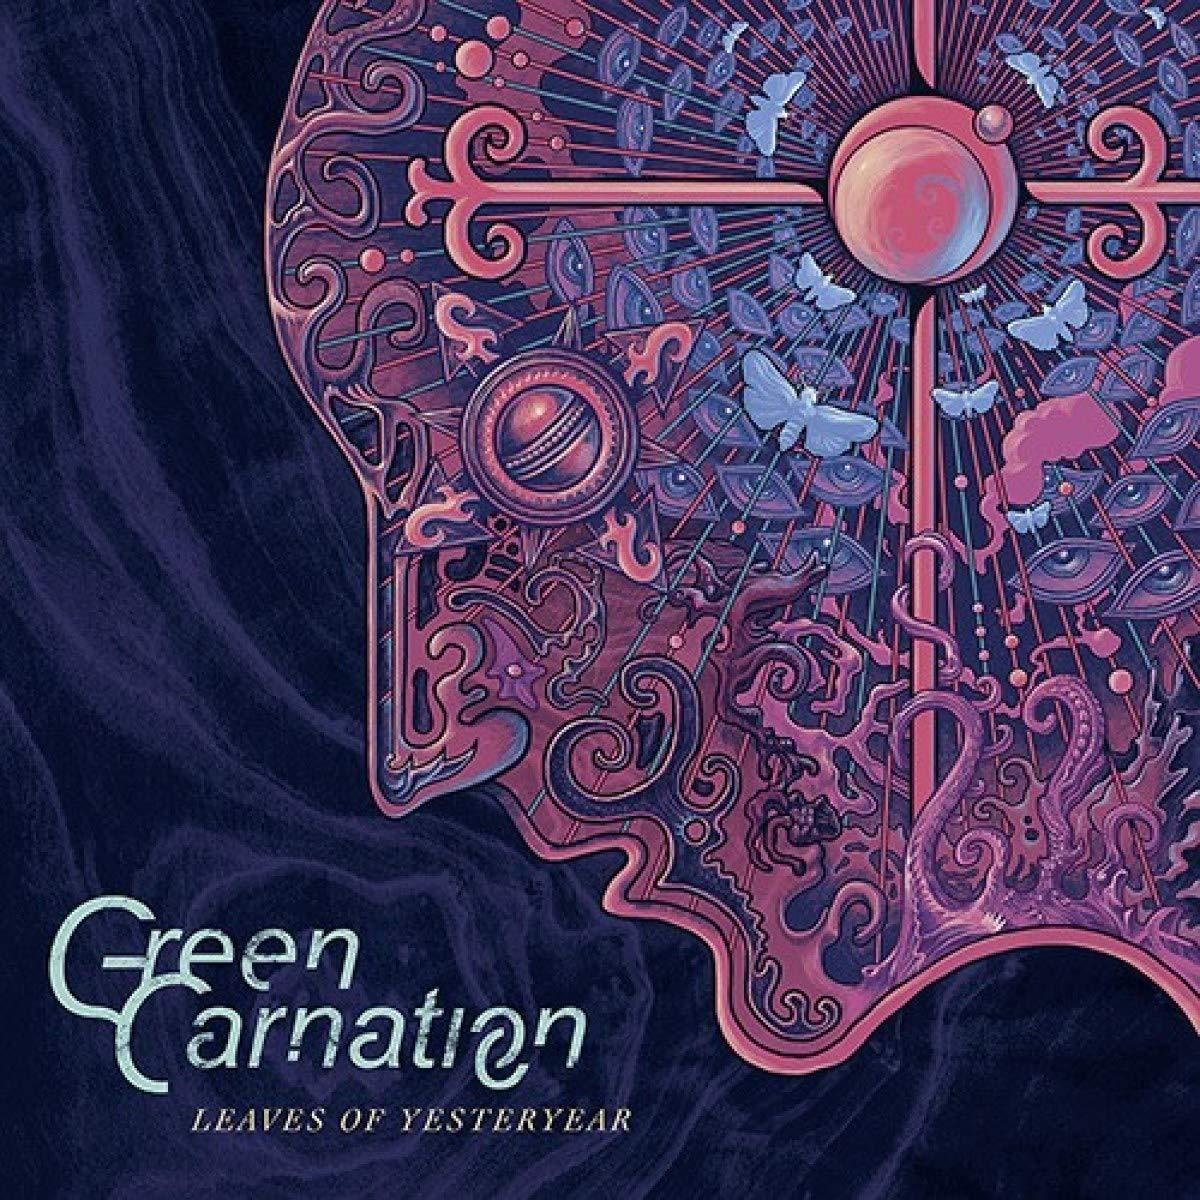 Green Carnation-Leaves of Yesteryear-CD-FLAC-2020-GRAVEWISH